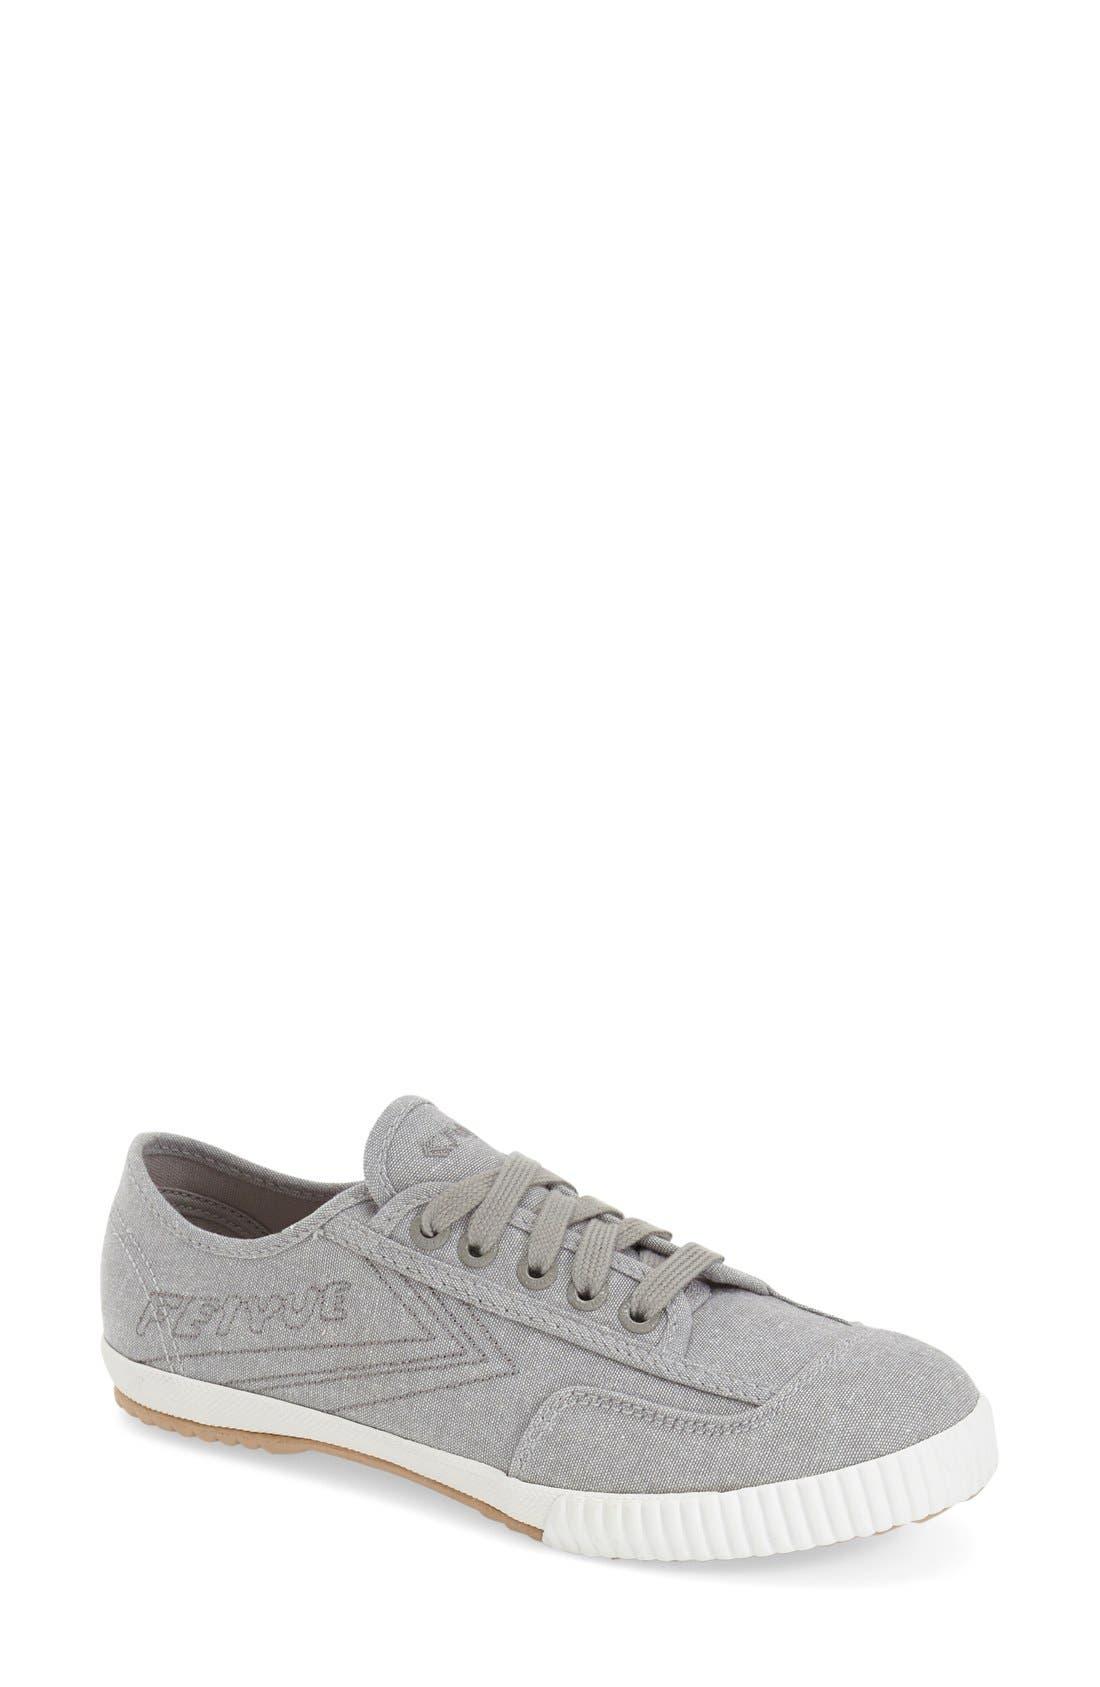 Main Image - Feiyue. 'Fe Lo Plain' Chambray Sneaker (Women)